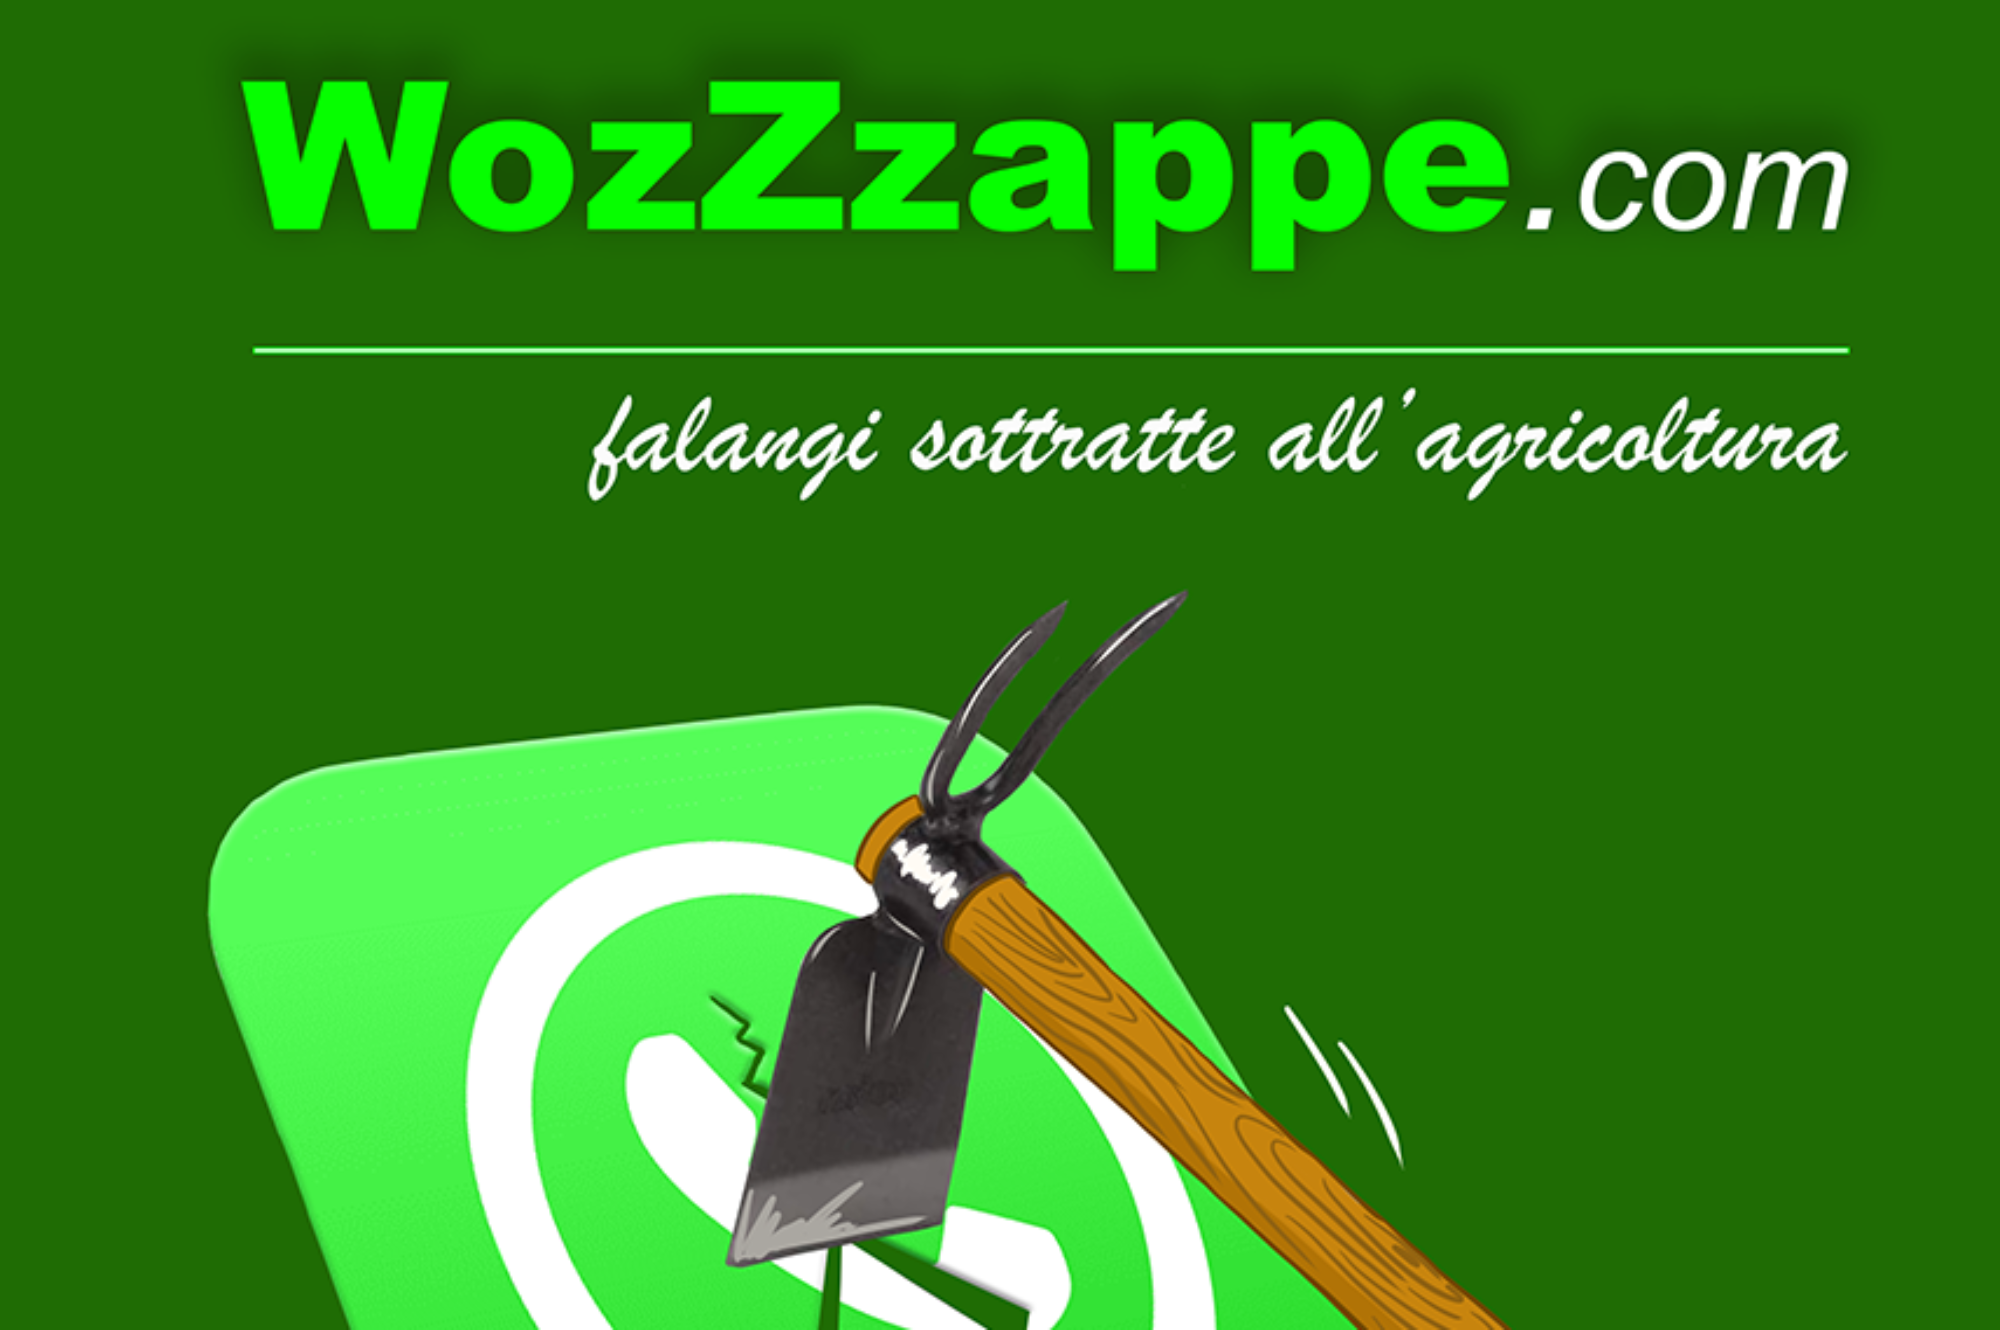 Wozzzappe.com